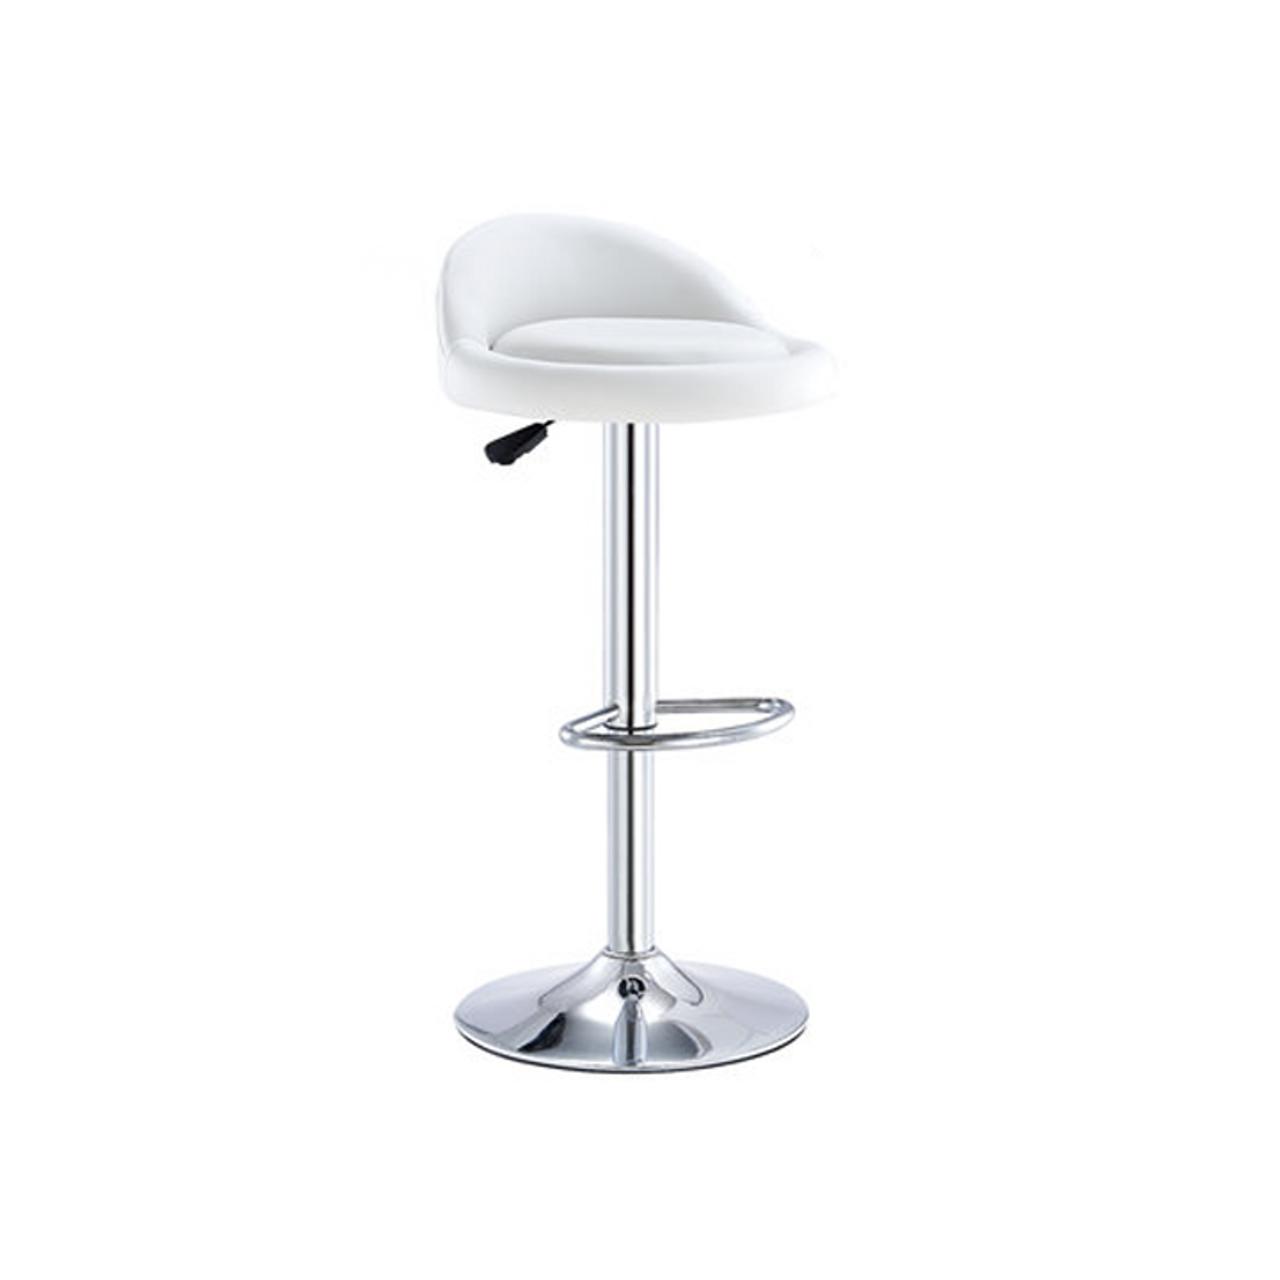 Marvelous Leather Hydraulic Lift Bar Chair White Machost Co Dining Chair Design Ideas Machostcouk